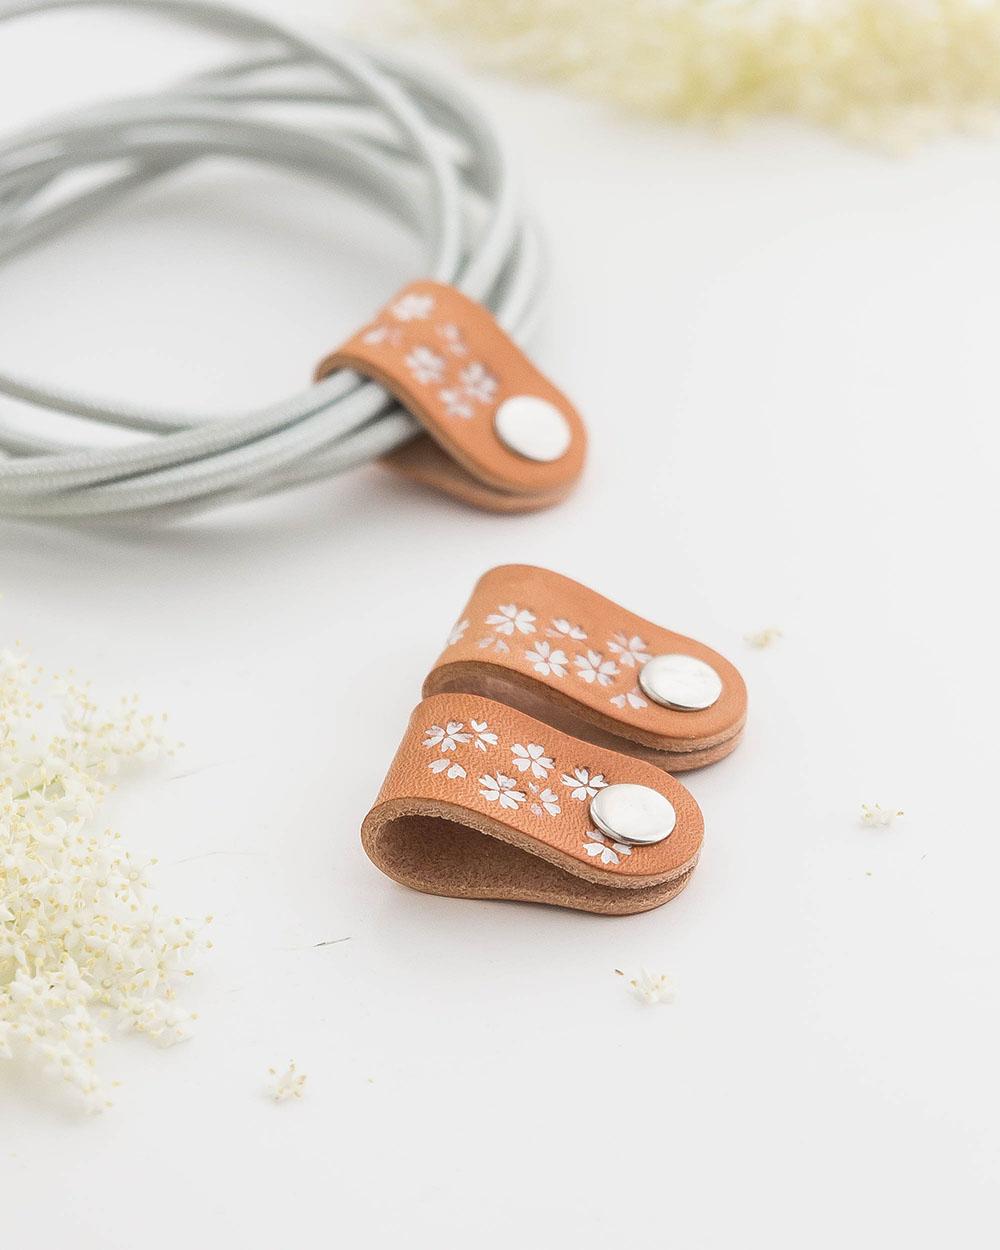 3er-Set Kabelhalter mit Sakura Weiß Blumenmotiv   Sakura flowers Cableholder 3 pieces white